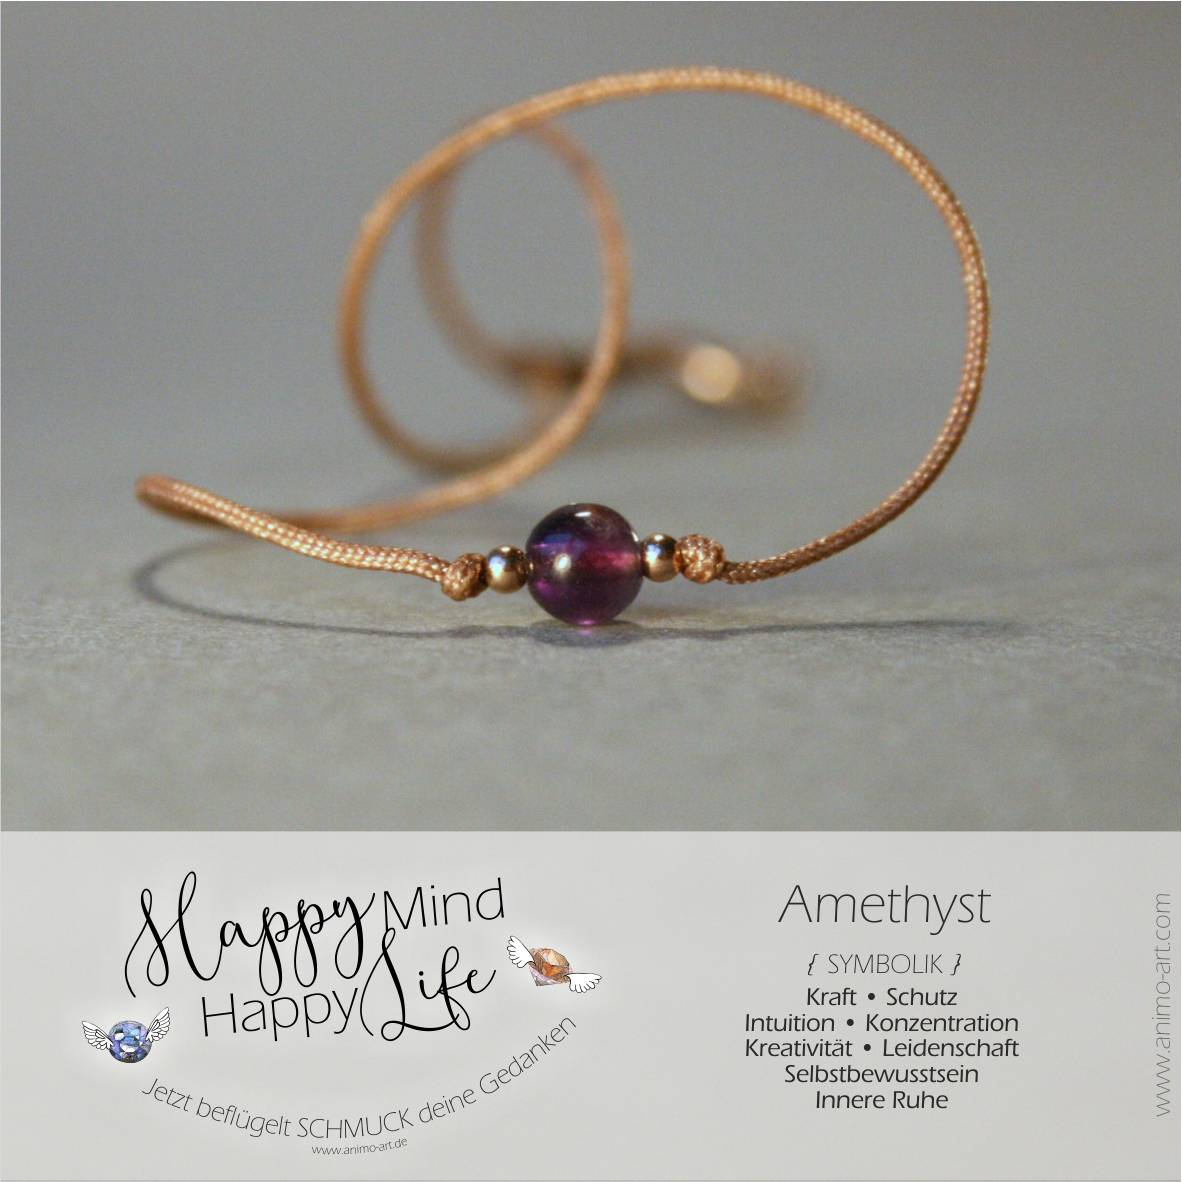 Amethyst Bedeutung / Armband mit Amethyst-Edelstein in lila violett, , Happy Mind Happy Life